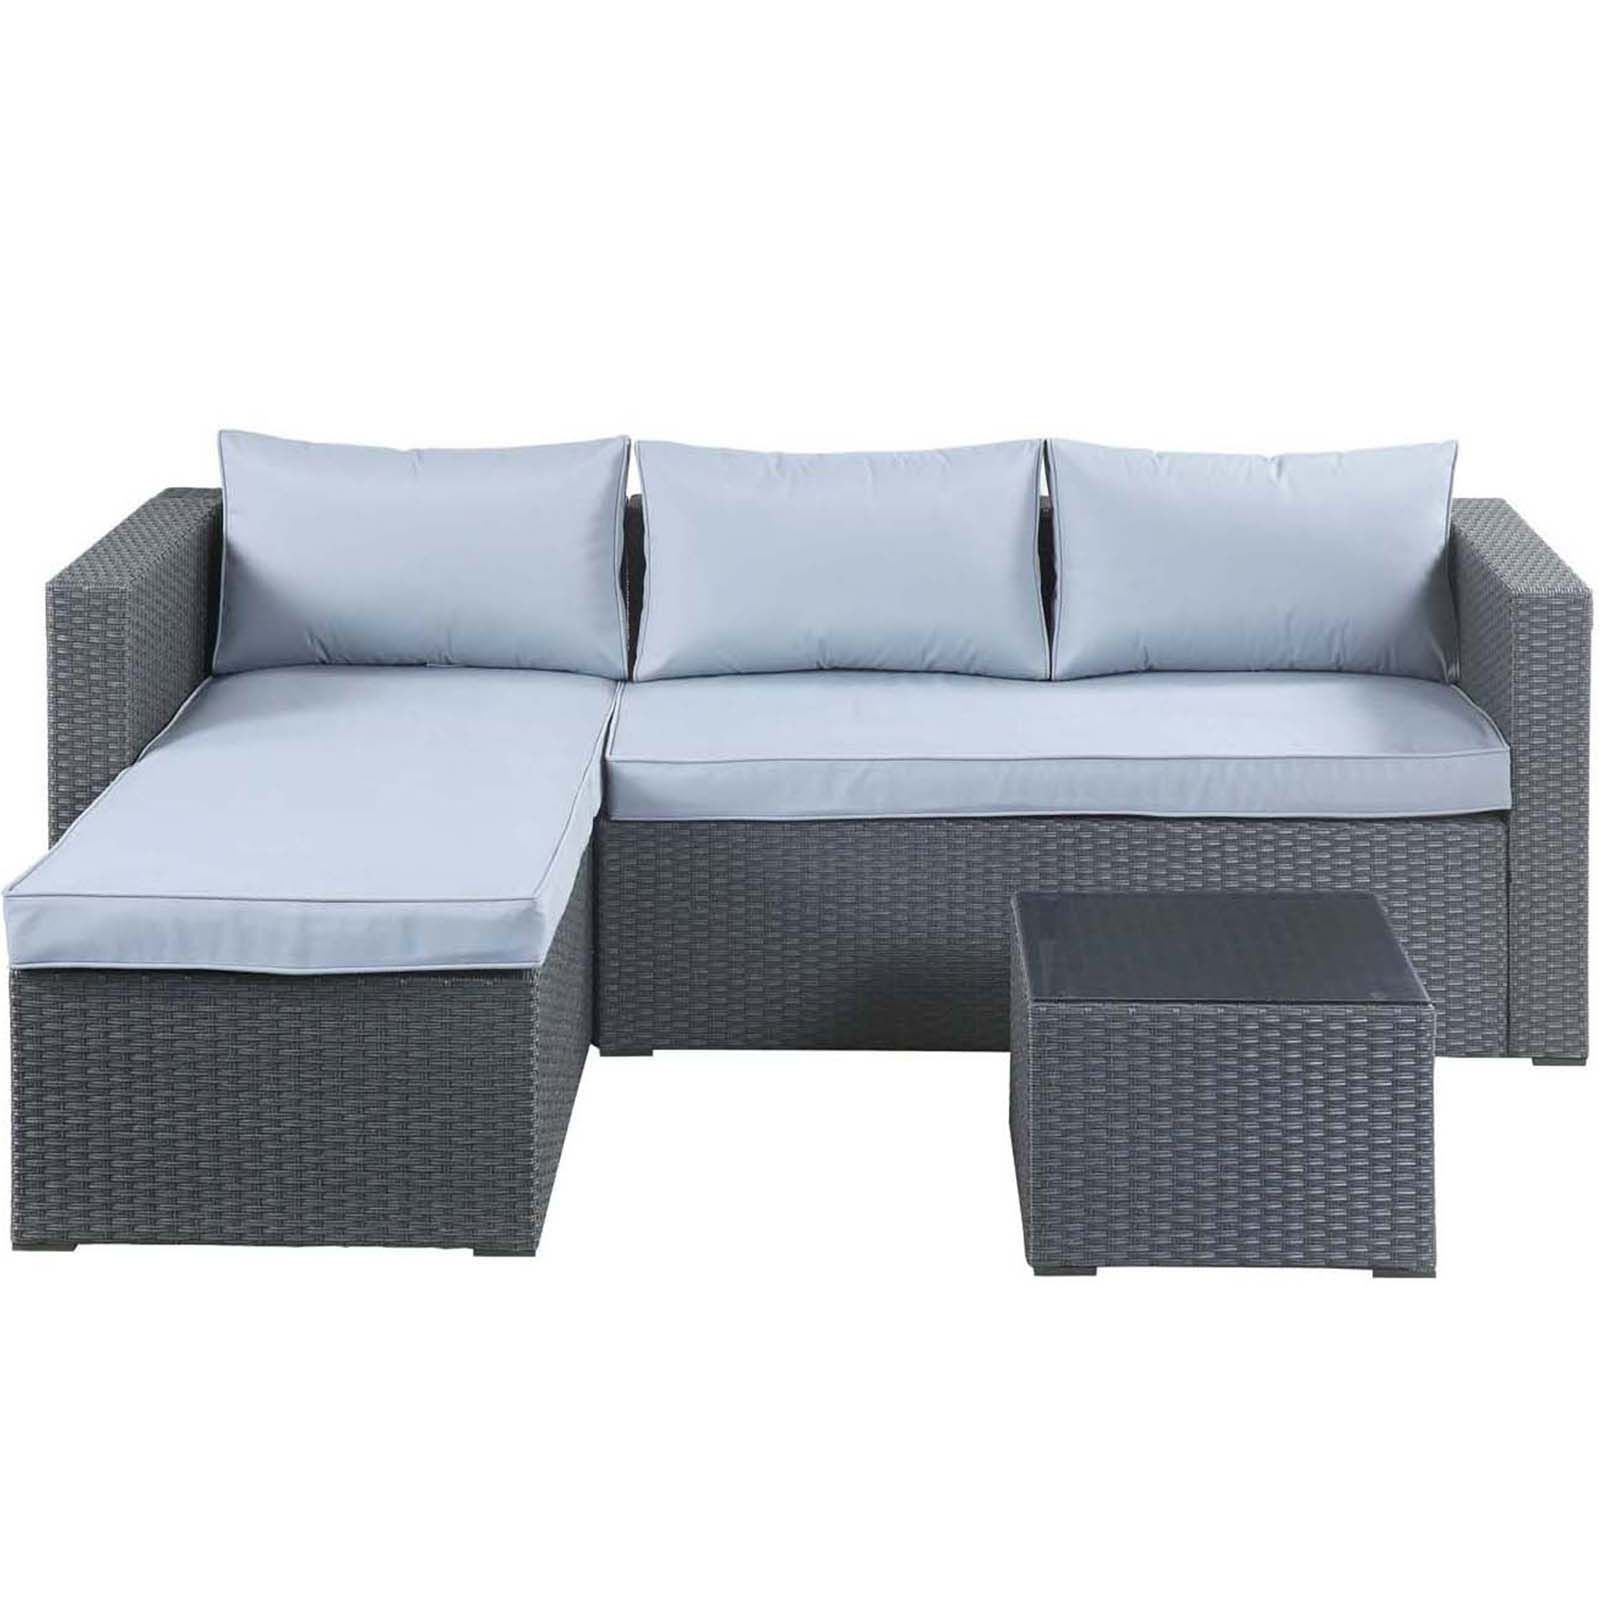 rattan effect garden corner sofa set z gallerie cleaning homebase microfinanceindia org